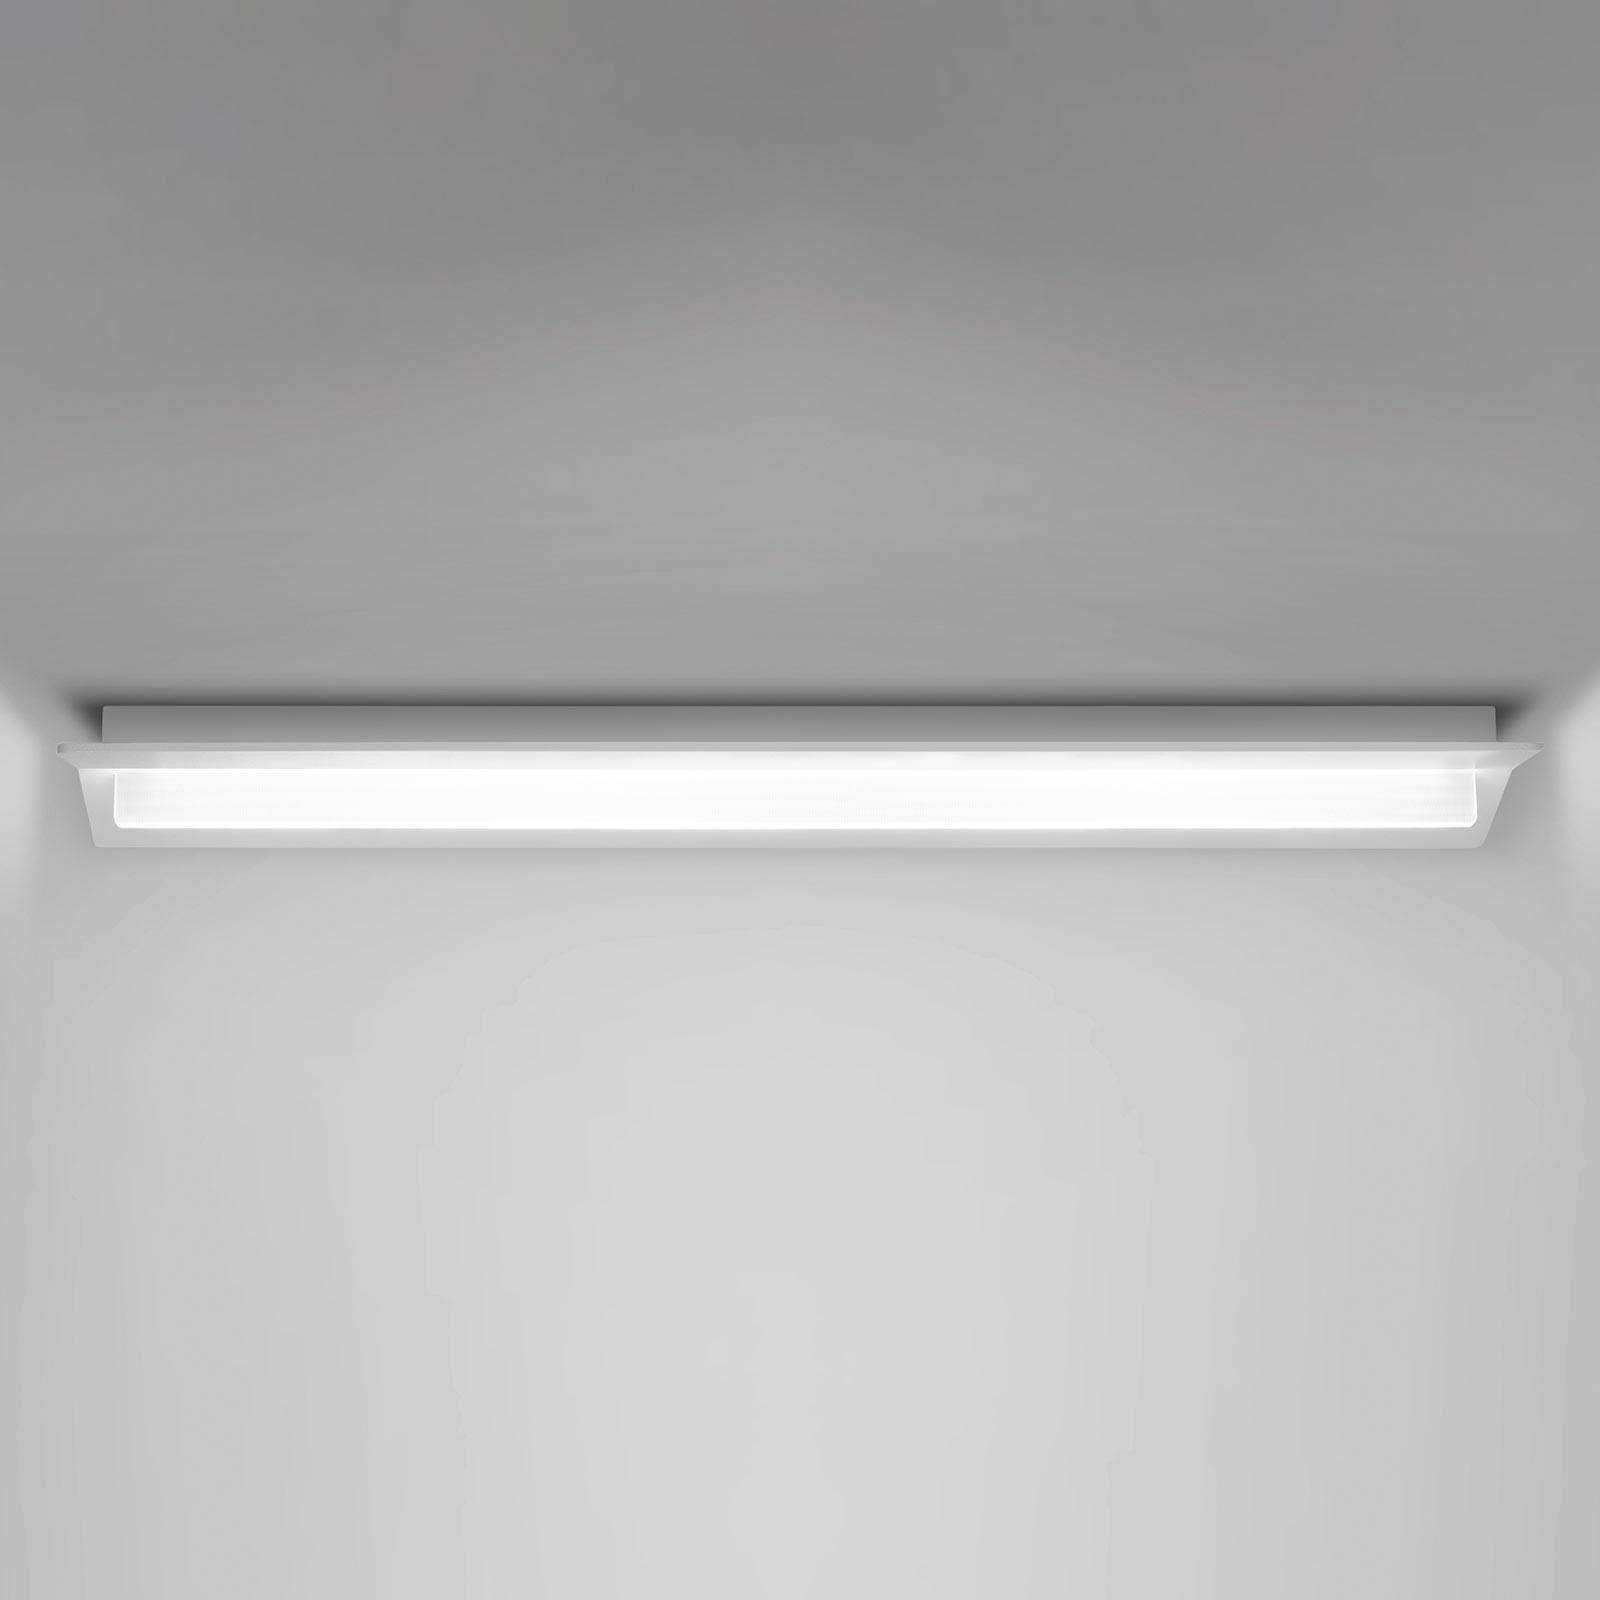 LED plafondlamp Flurry, 70 cm, wit